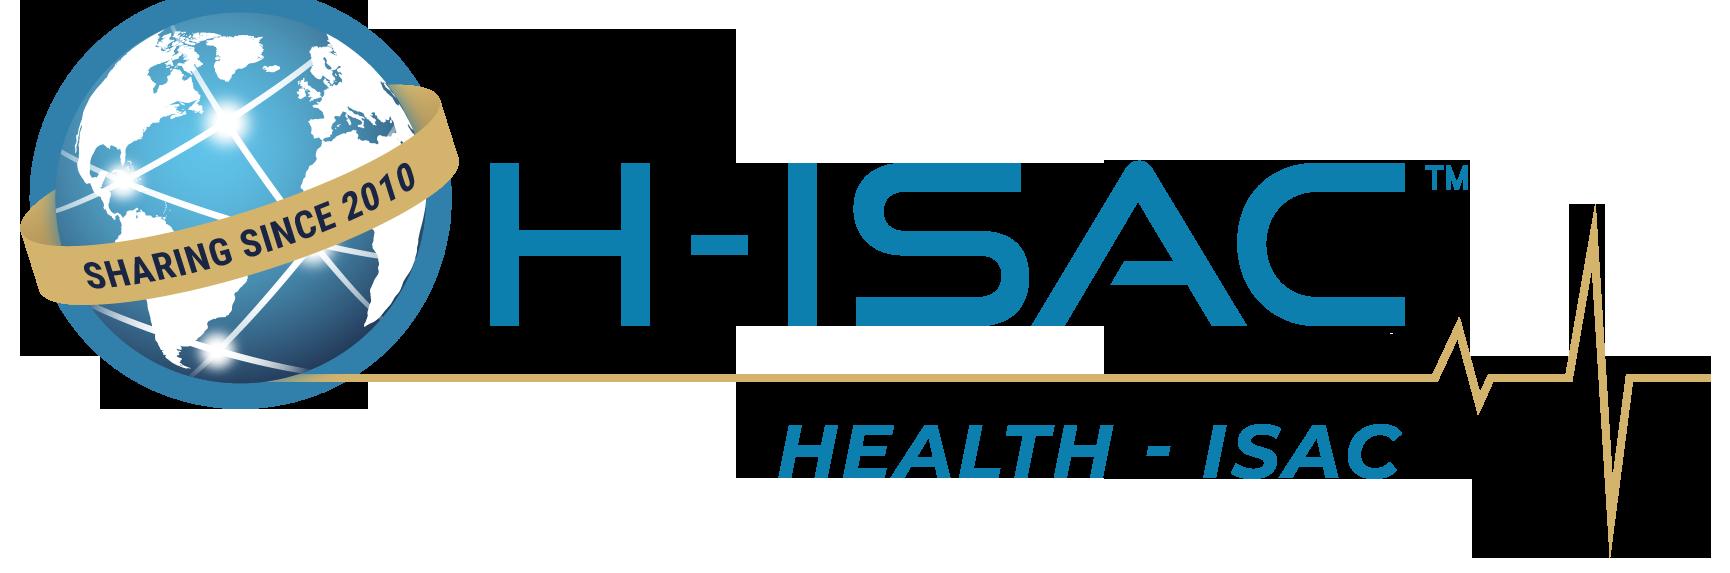 Health - ISAC, sharing since 2010